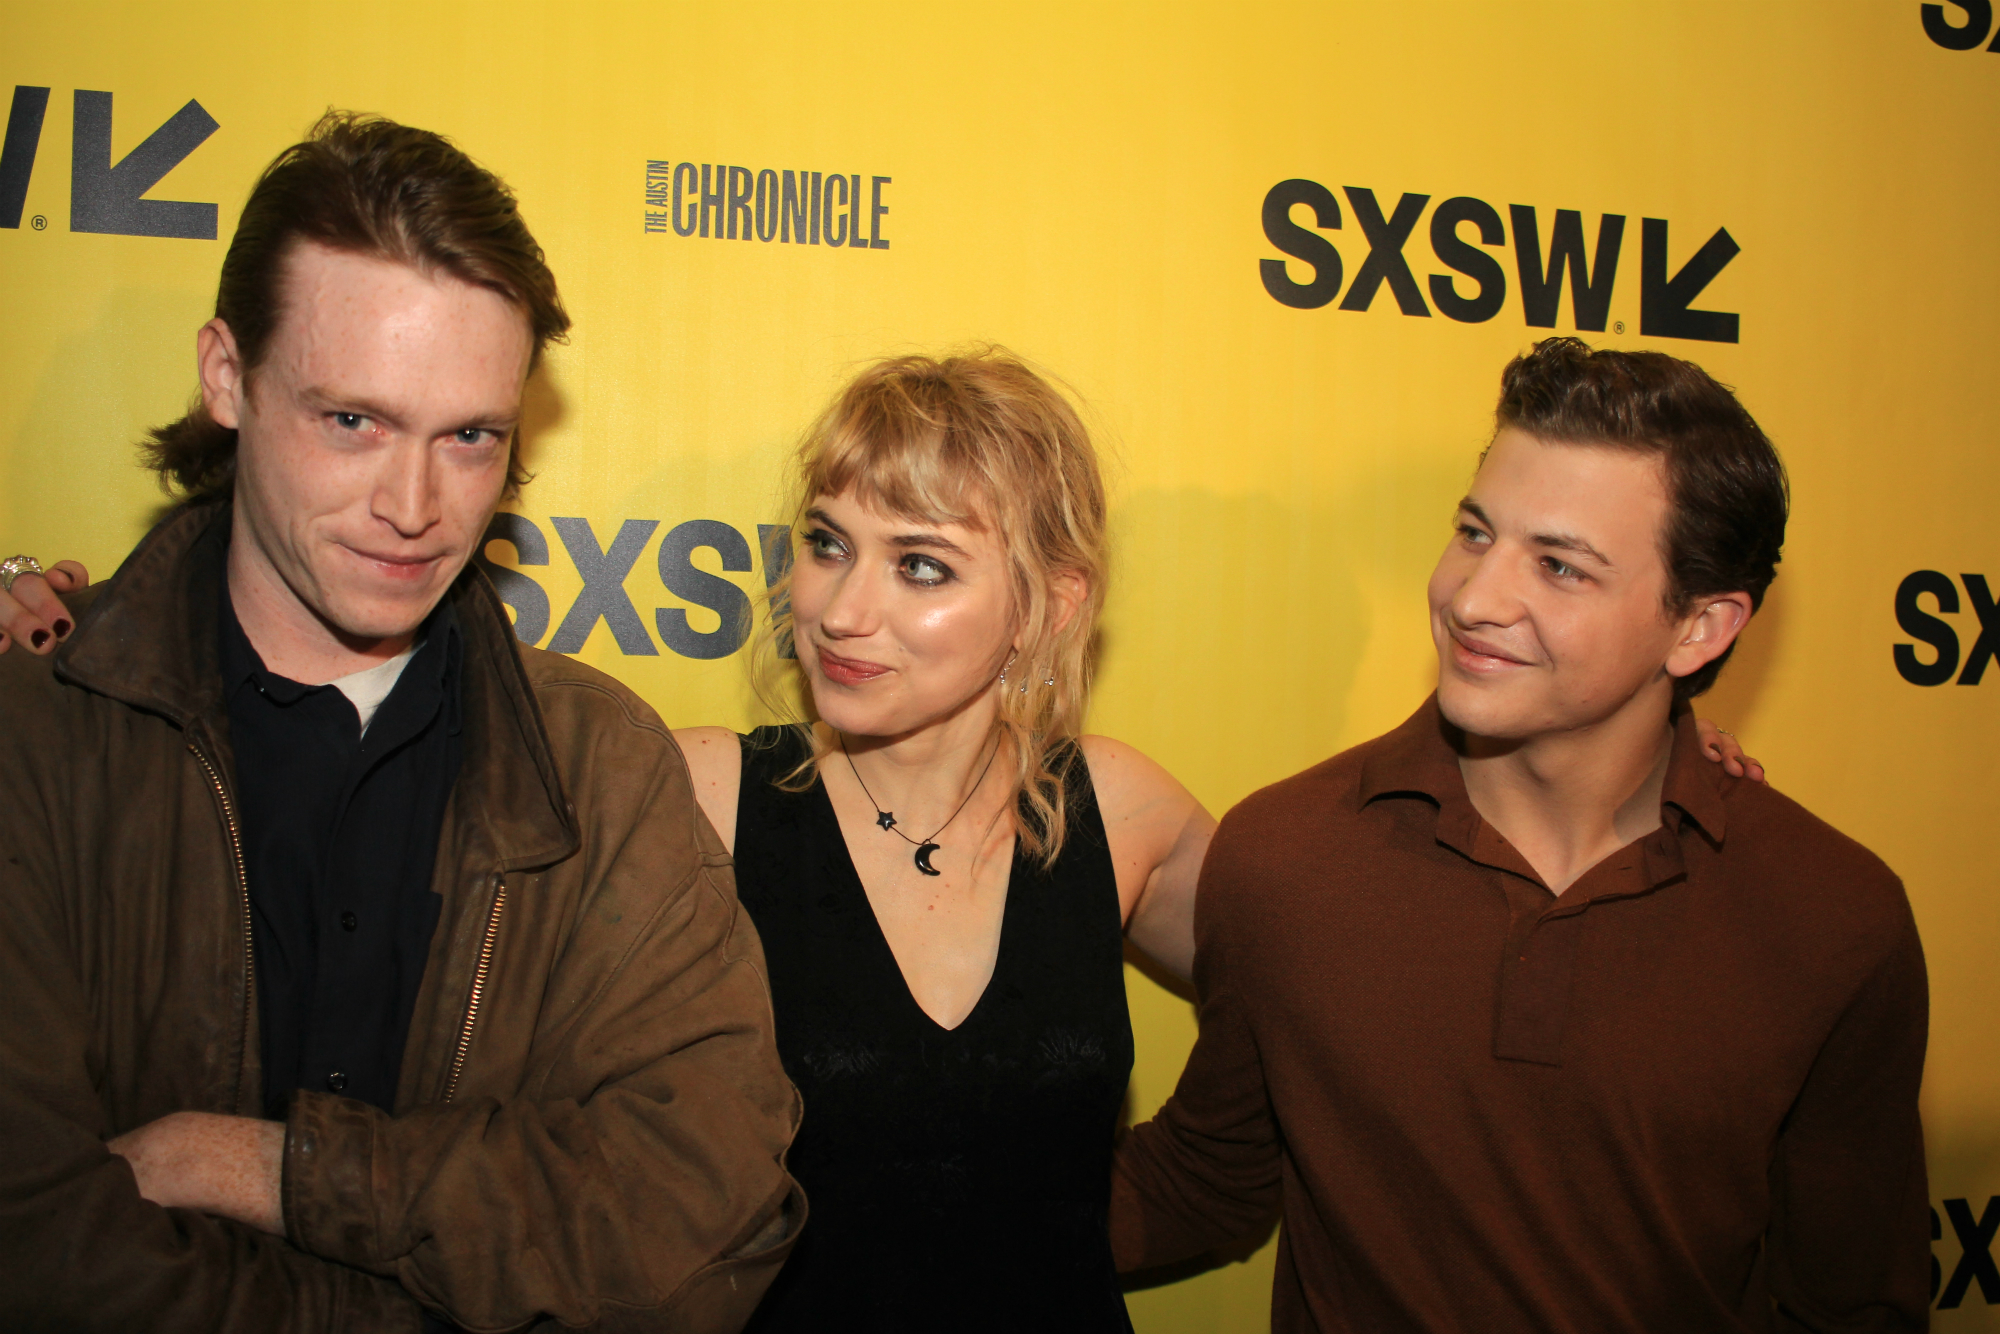 Caleb Landry Jones, Imogen Poots, and Tye Sheridan // Friday's Child, photo by Heather Kaplan